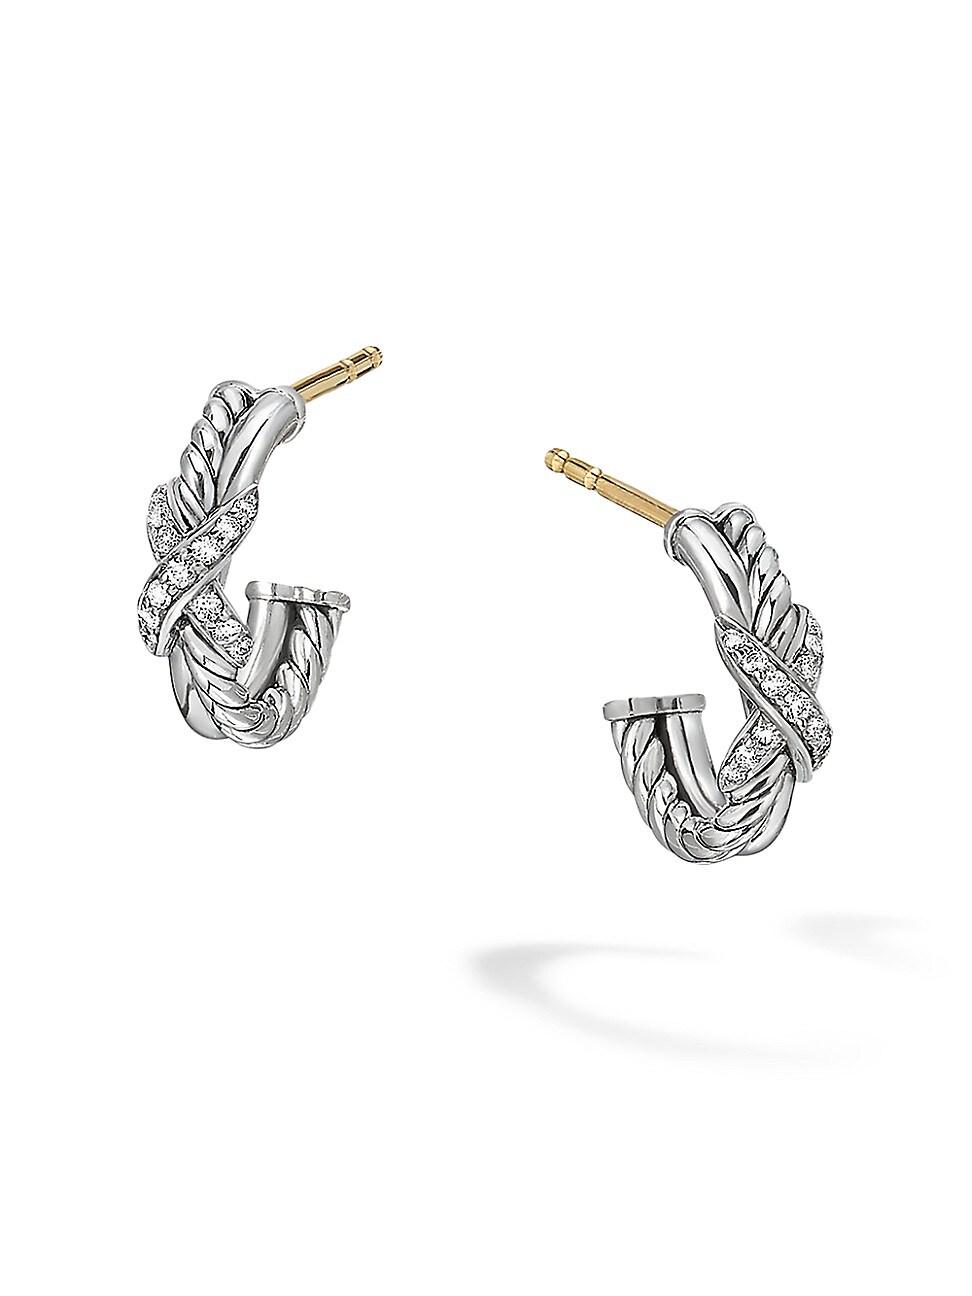 David Yurman Earrings WOMEN'S PETITE X MINI HOOP EARRINGS WITH DIAMONDS